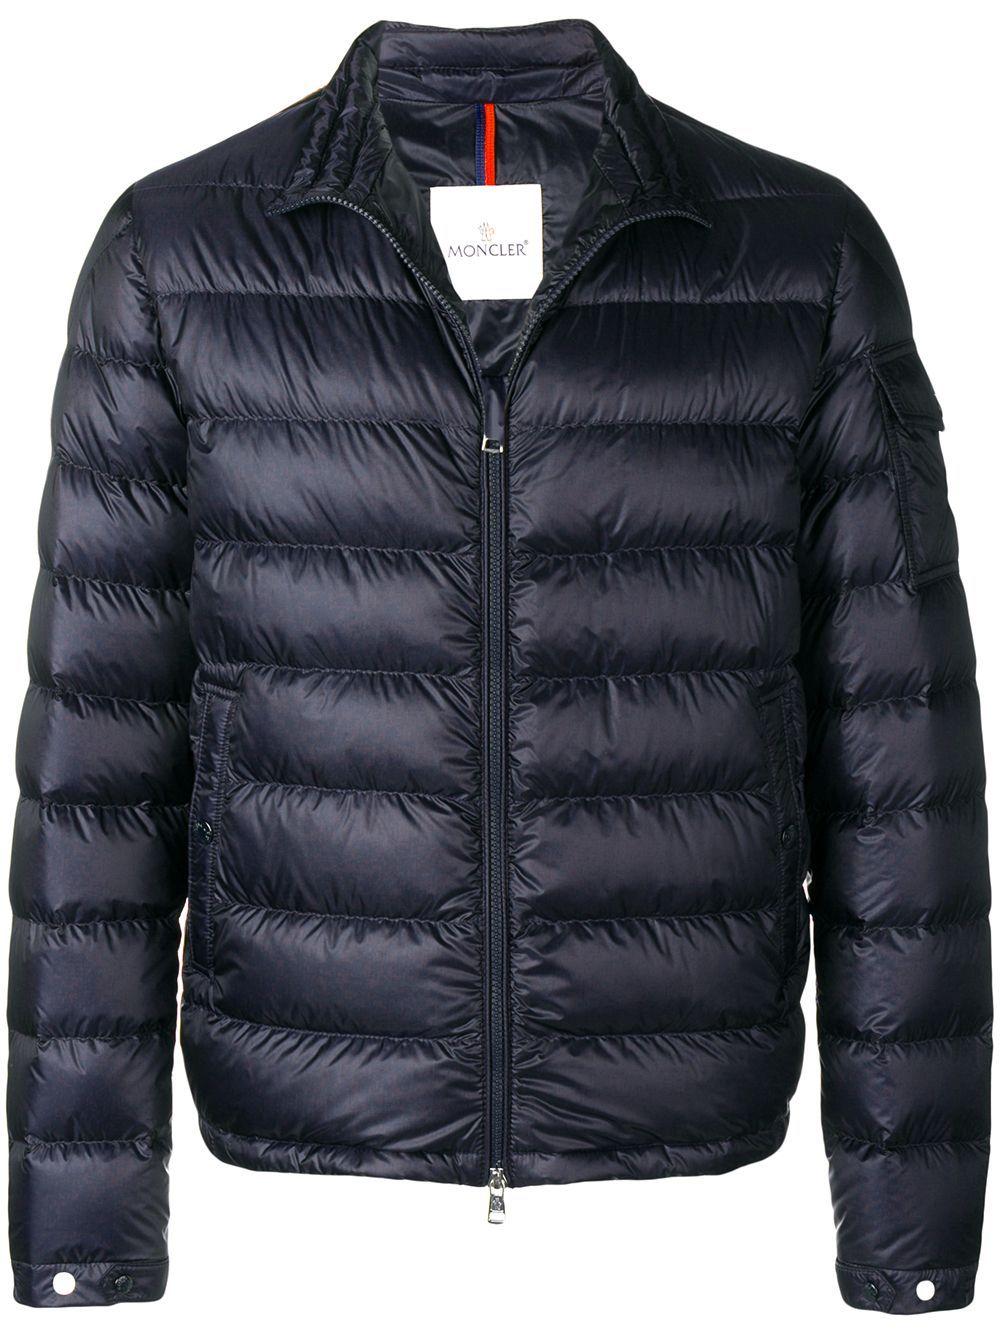 Moncler Moncler Lambot Jacket Blue Moncler Cloth [ 1334 x 1000 Pixel ]